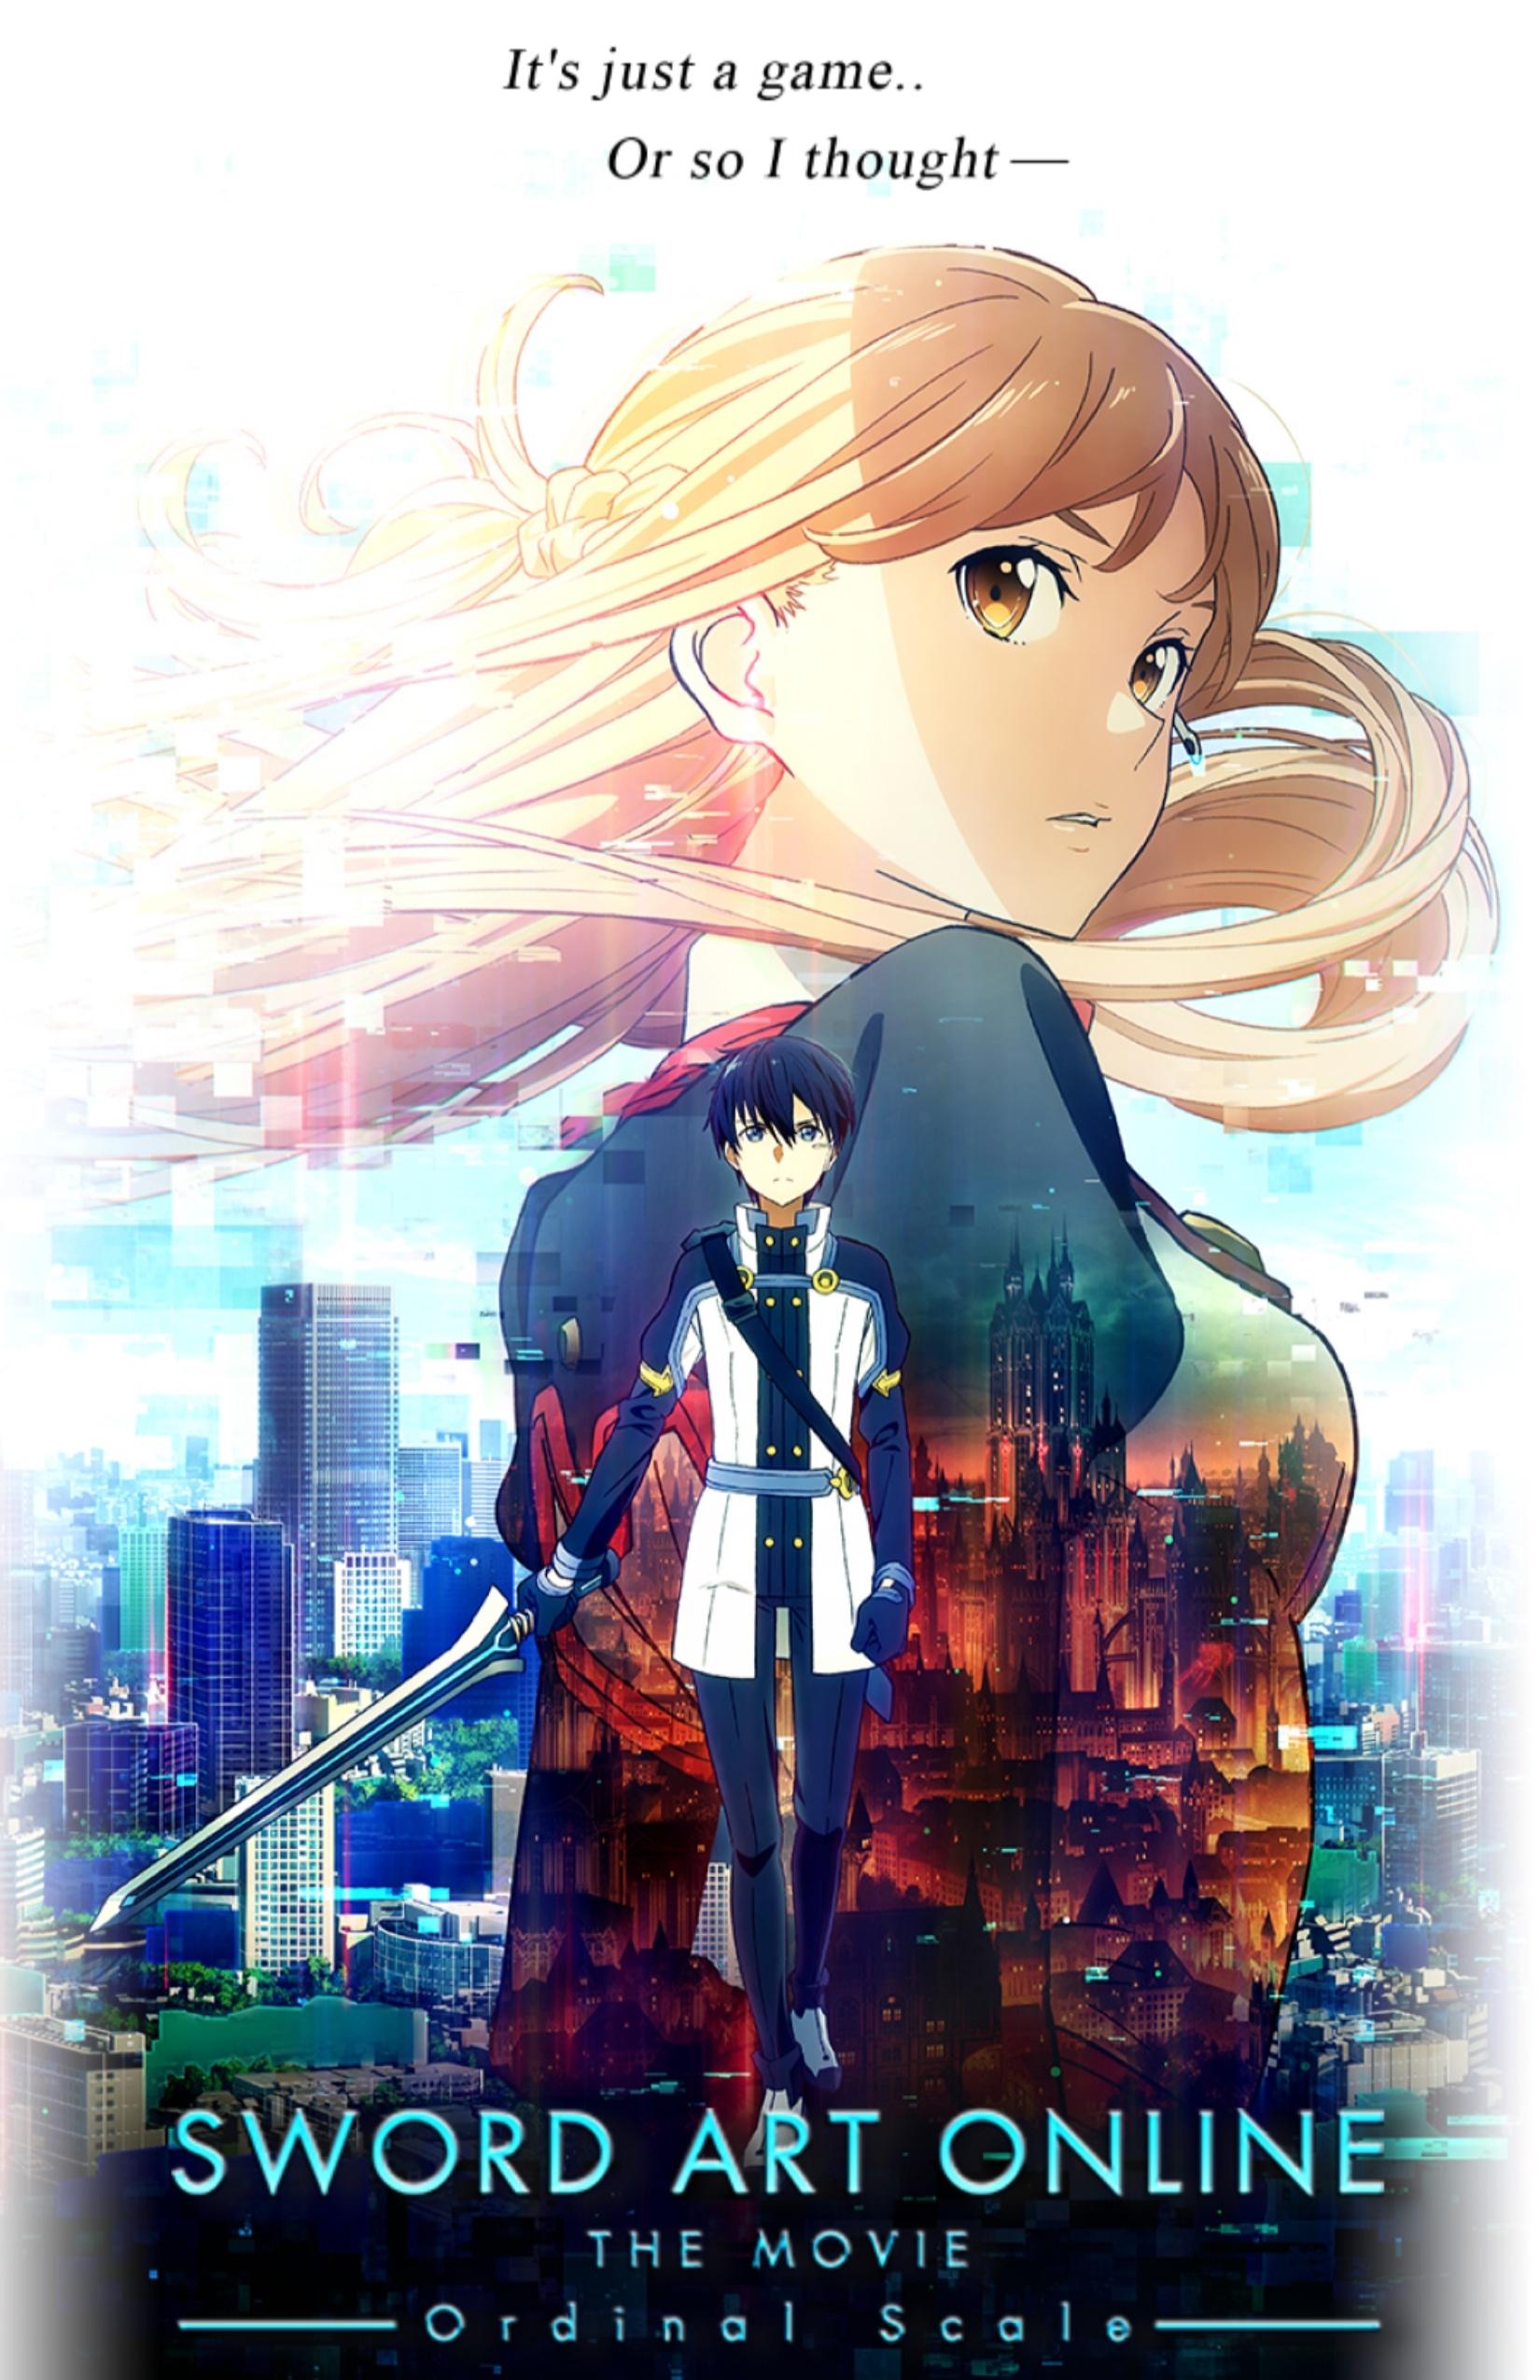 Sword Art Online The Movie: Ordinal Scale Kinox.To